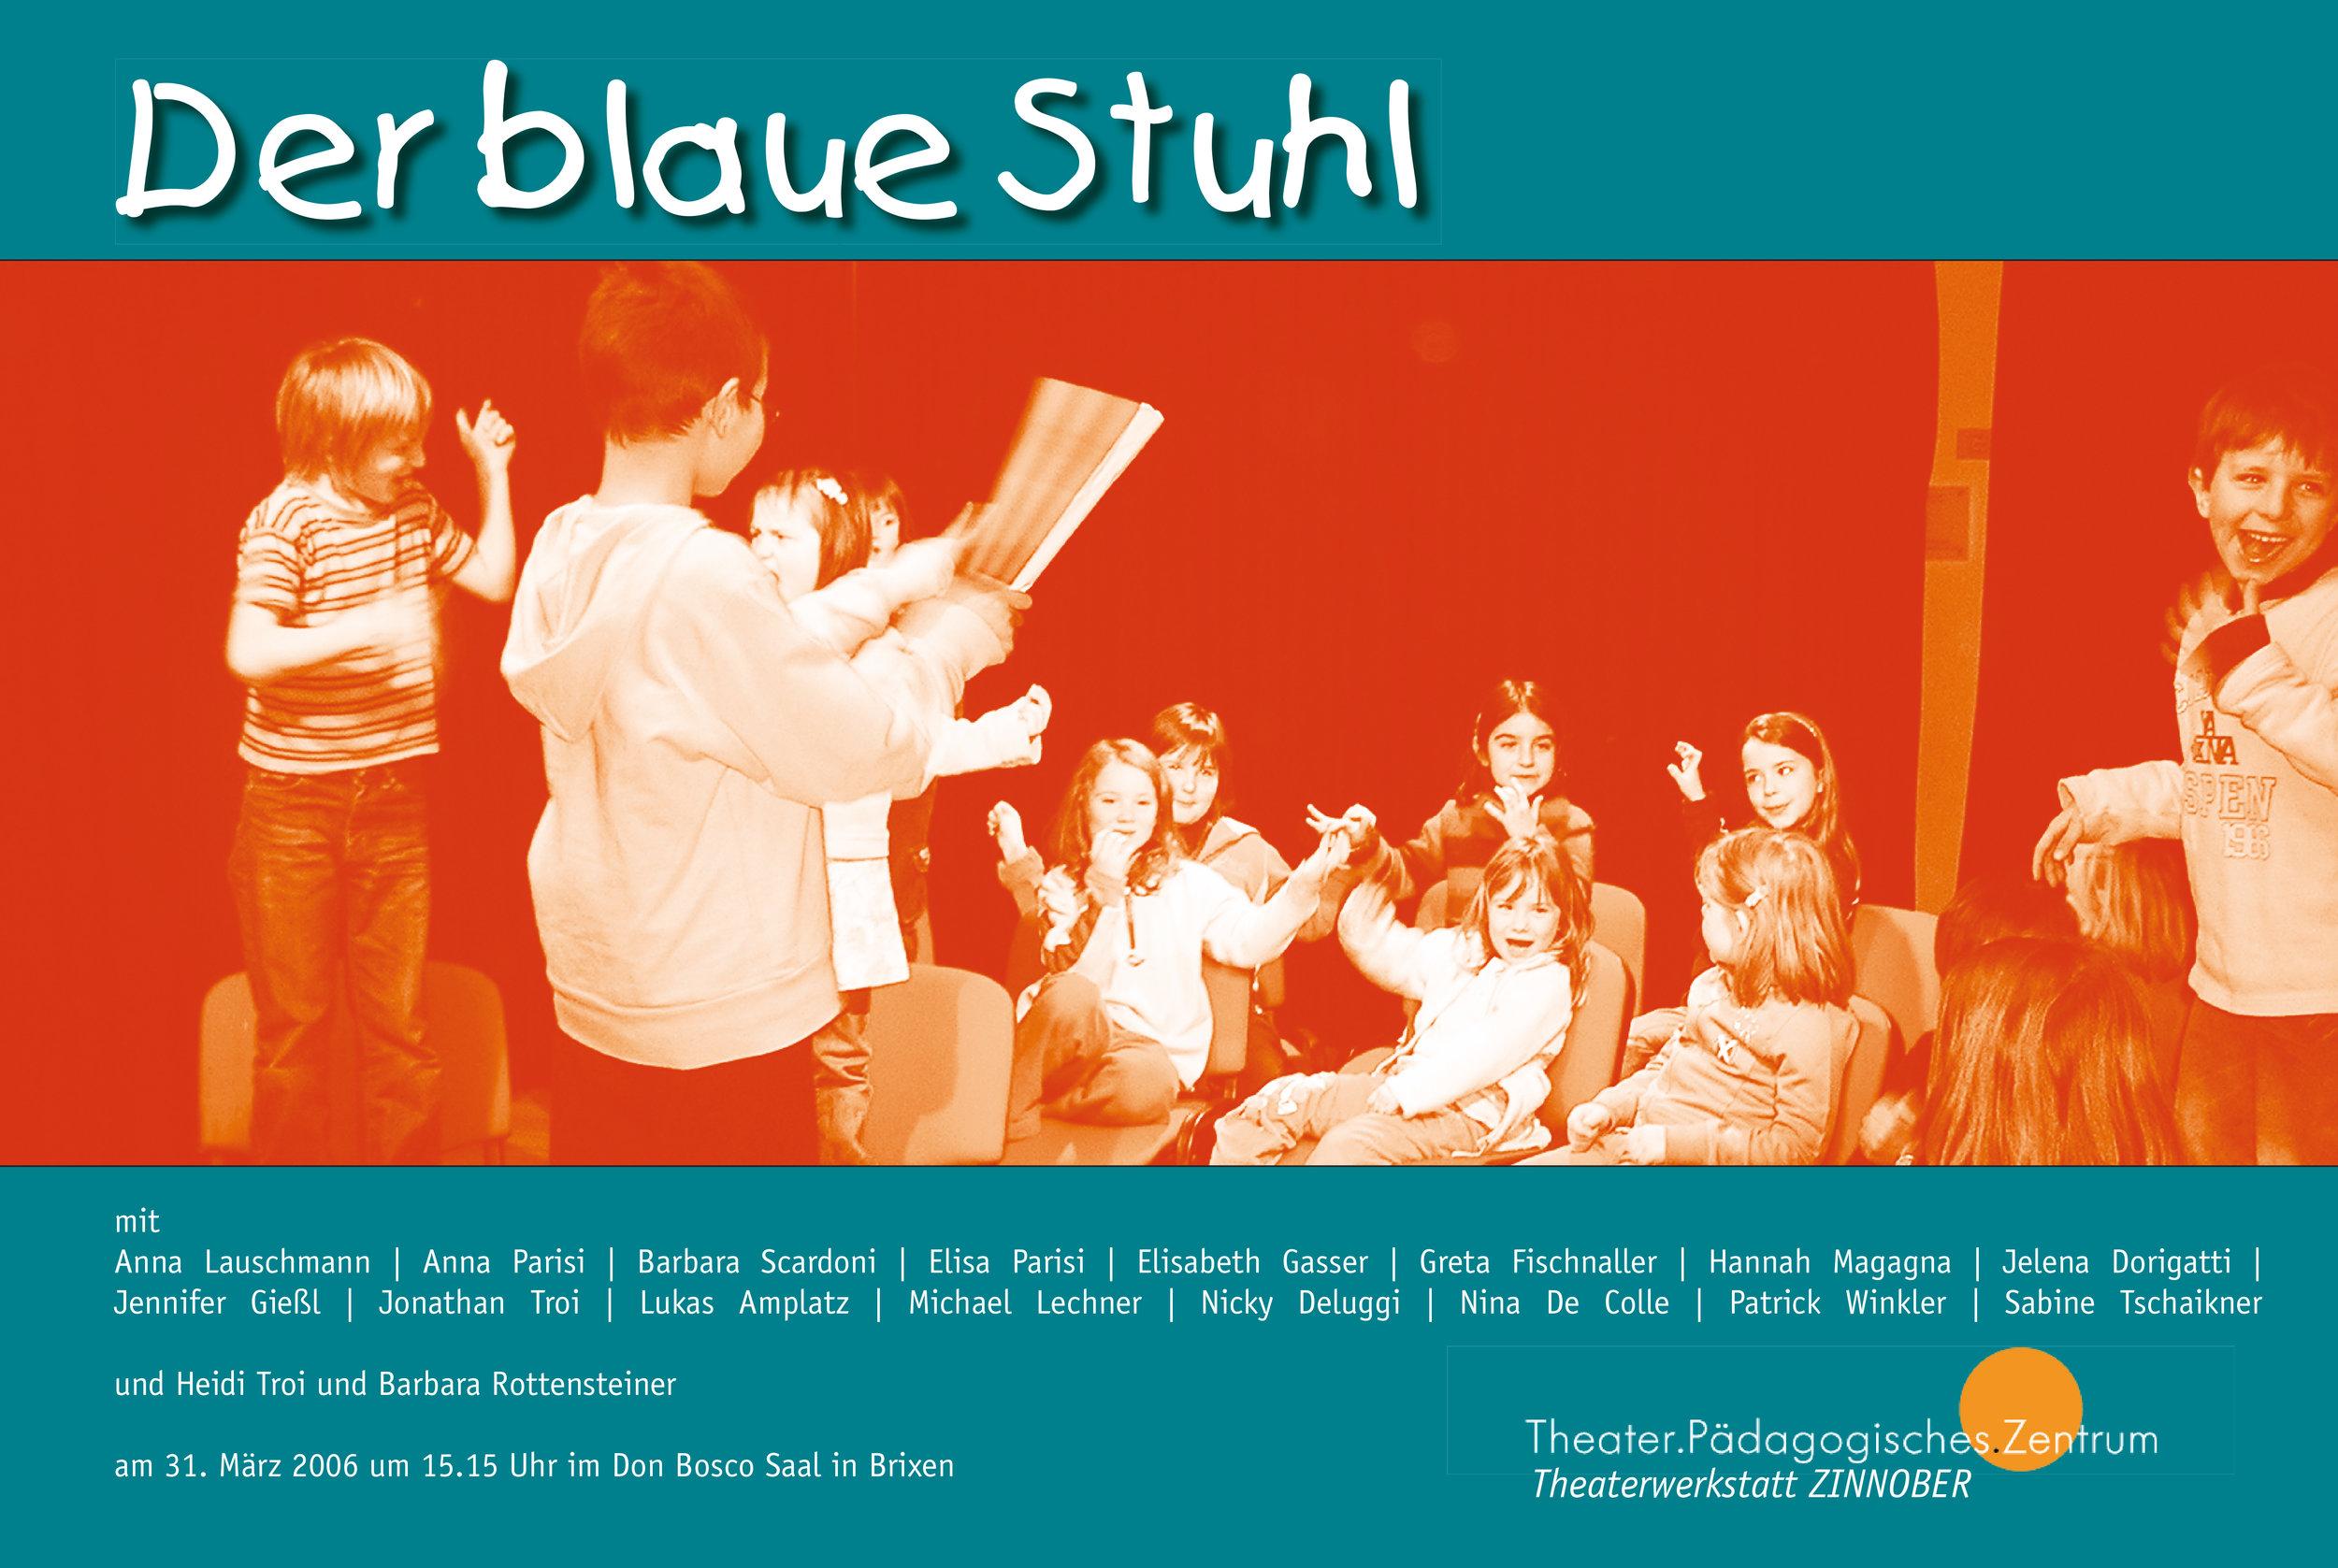 2006 zinnober Der blaue Stuhl Plakat.jpg